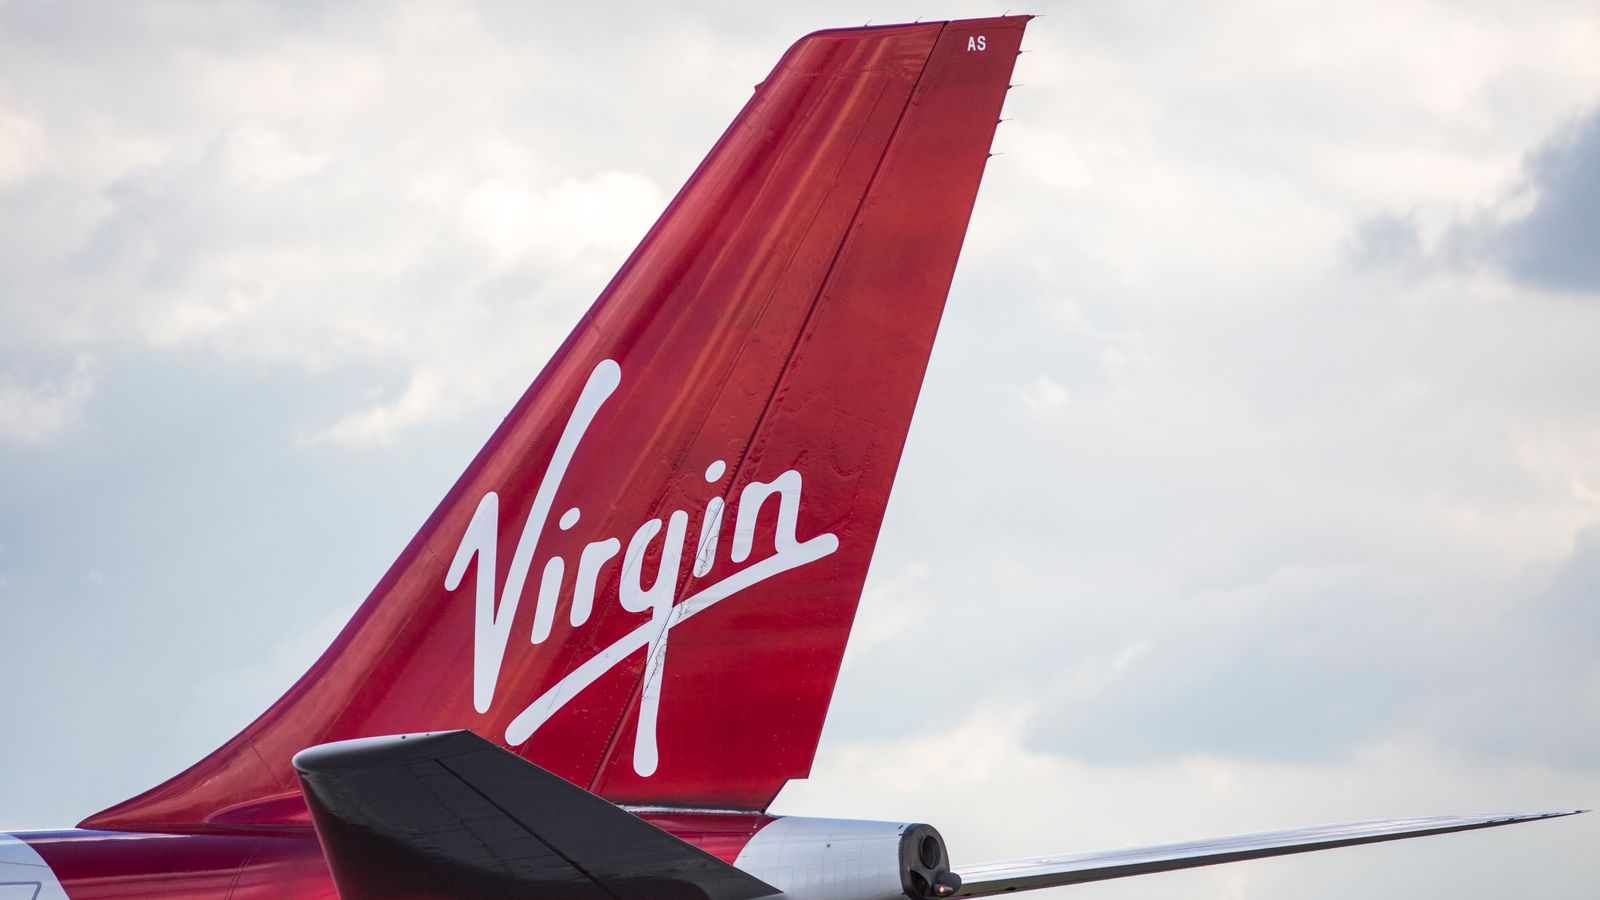 Coronavirus: Aviation giants lobby for Virgin Atlantic bailout